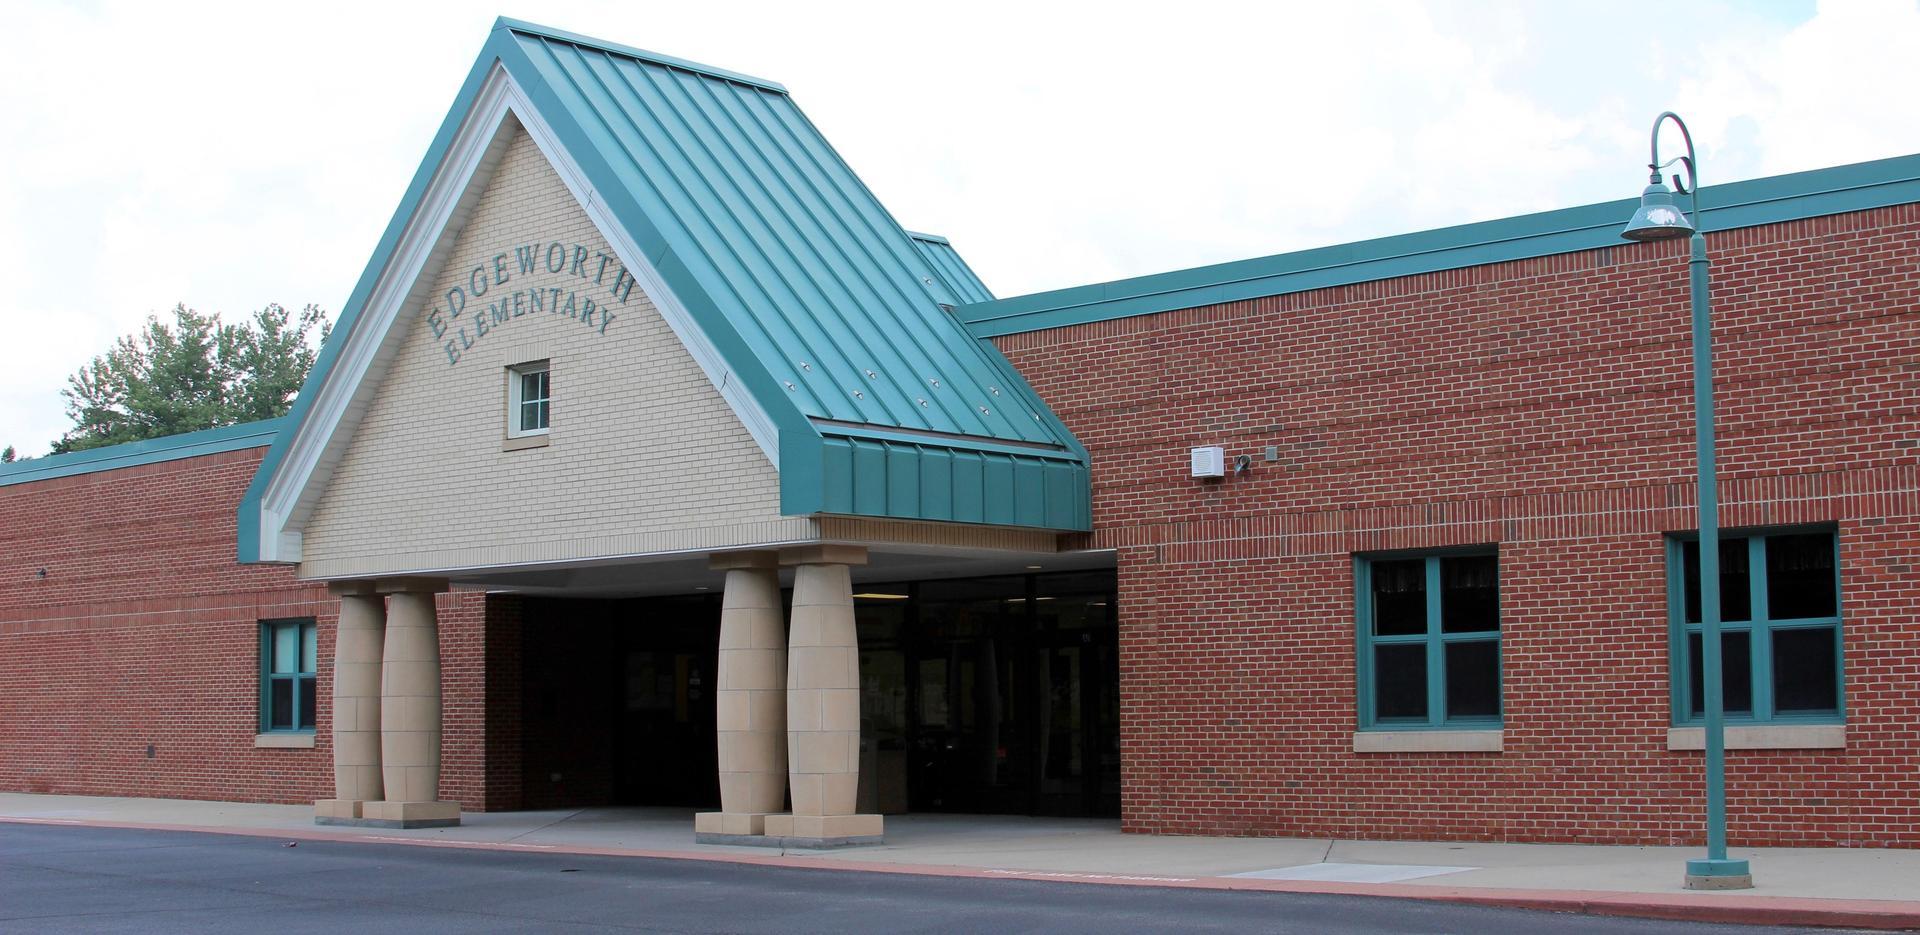 Edgeworth Elementary School